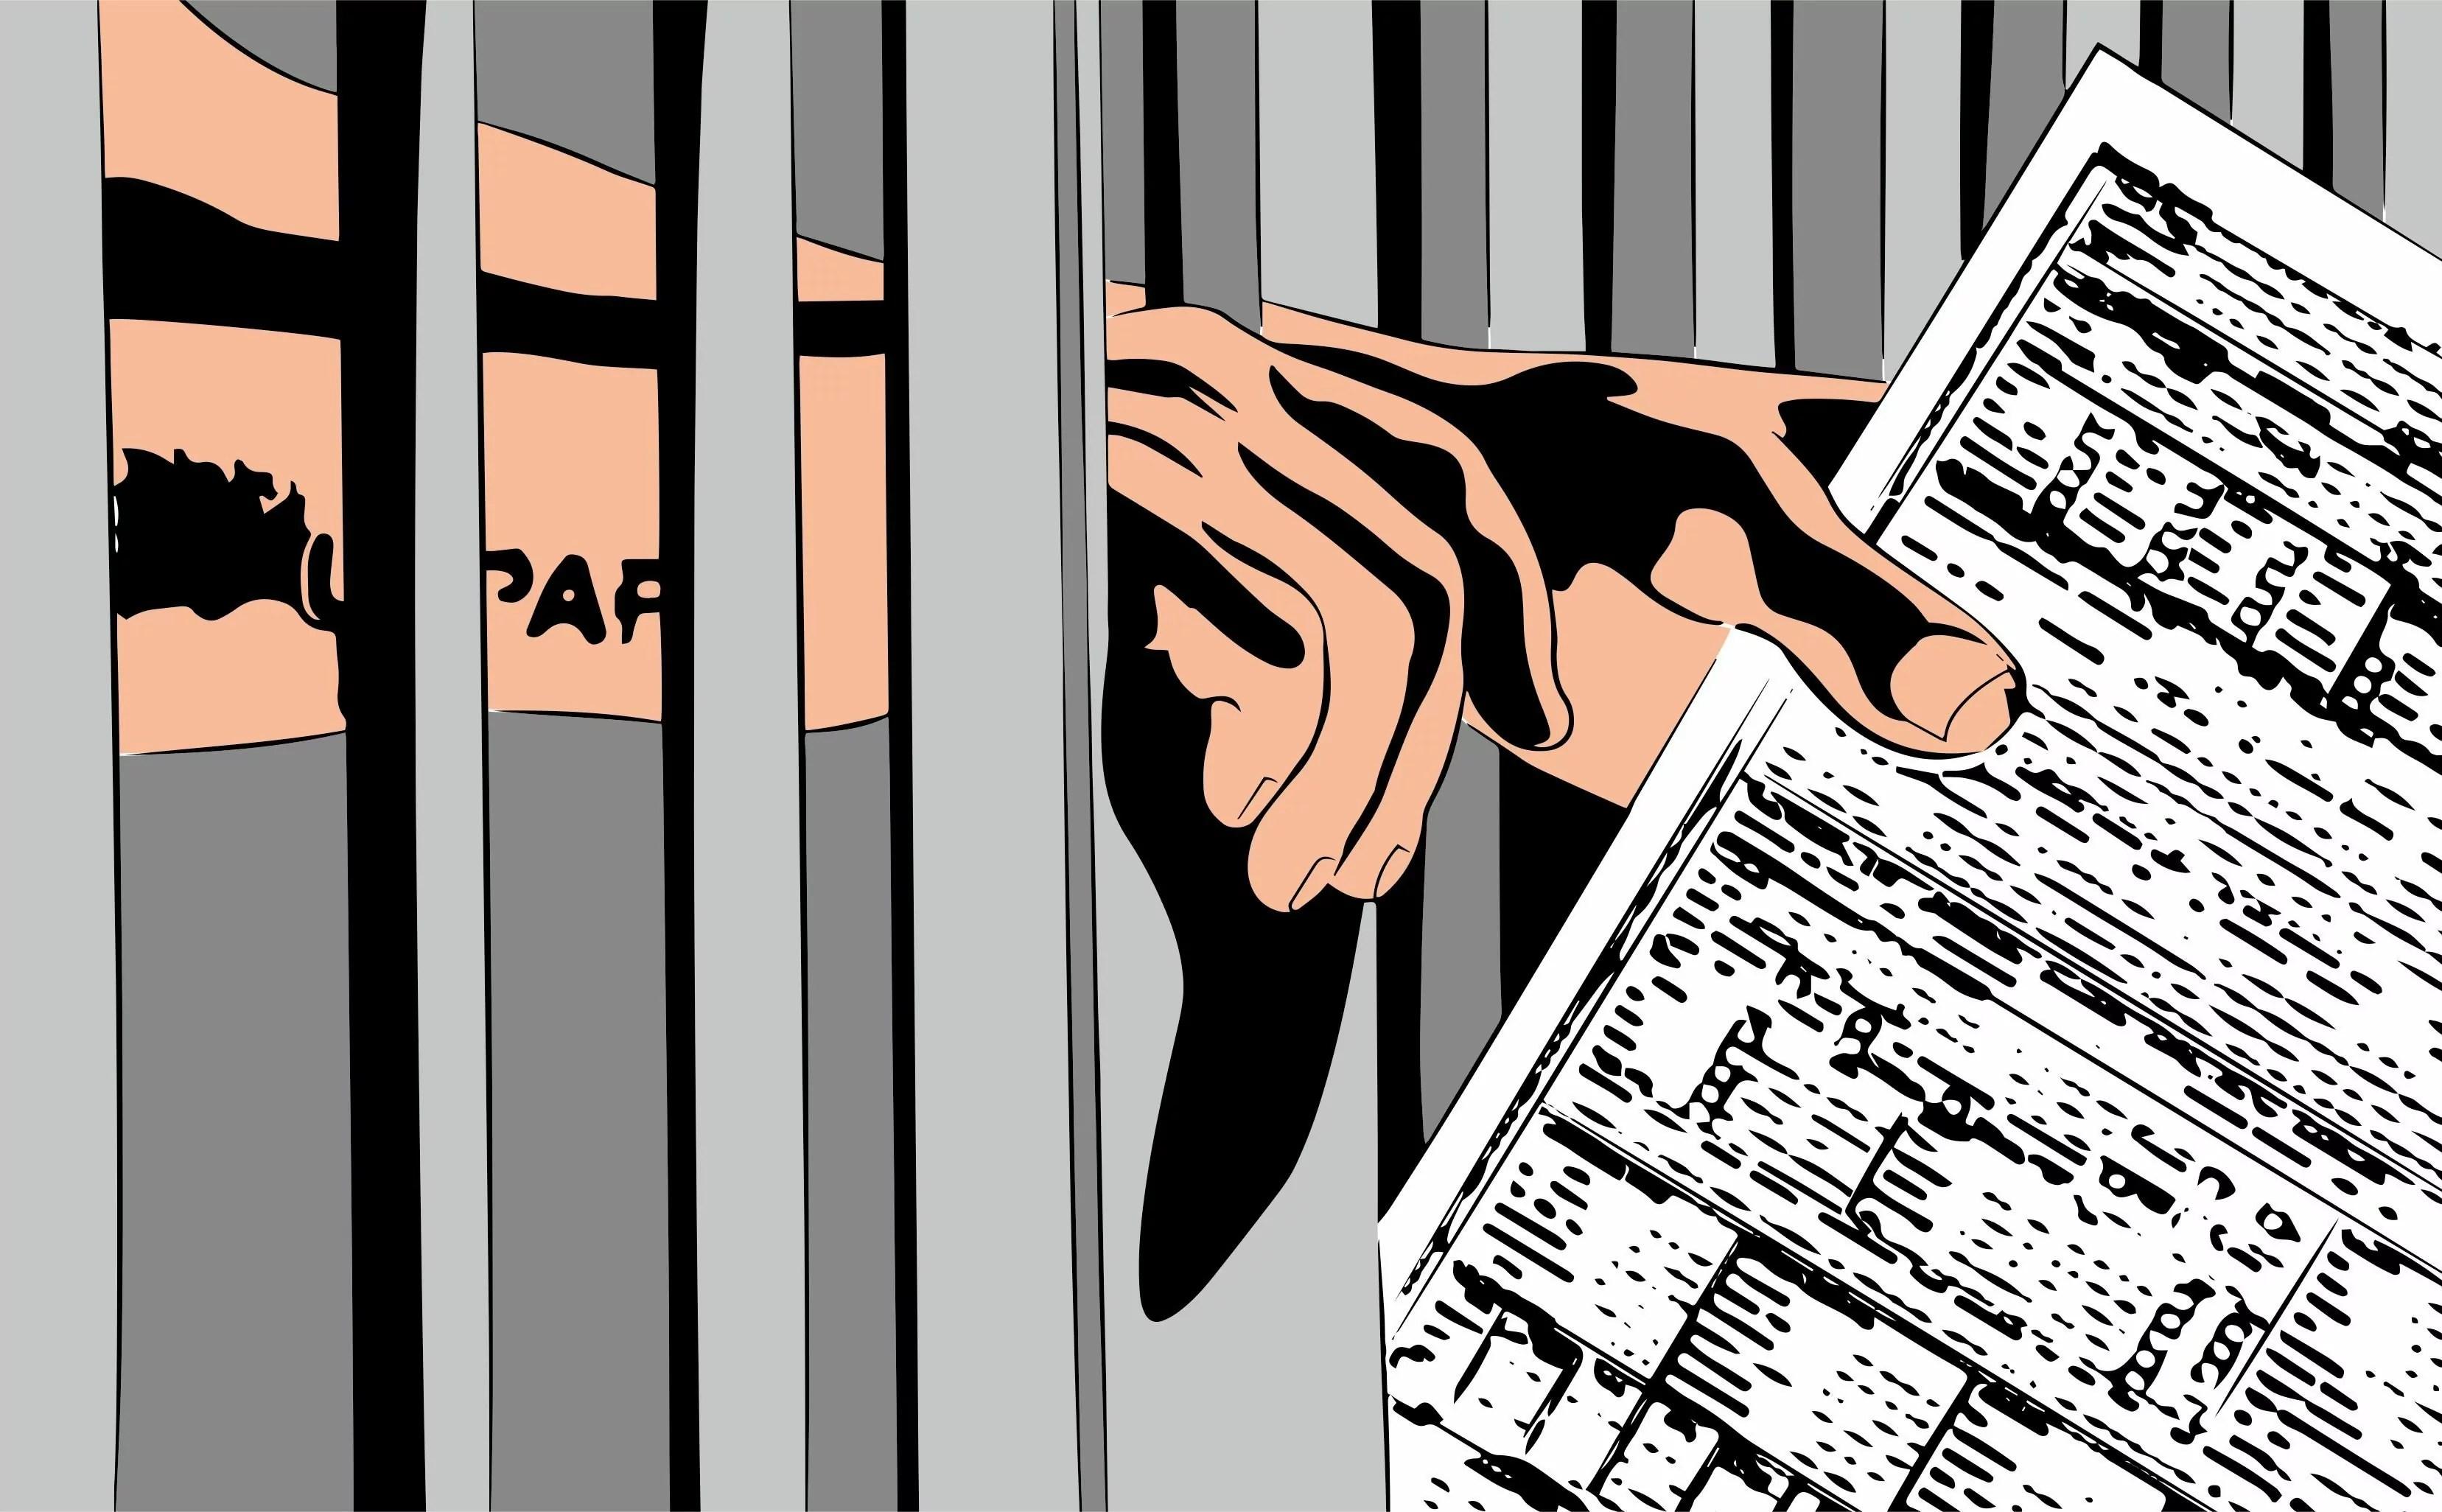 securities fraud penalties Las Vegas NV Mortgage Fraud Attorneys: Penalties, Defense